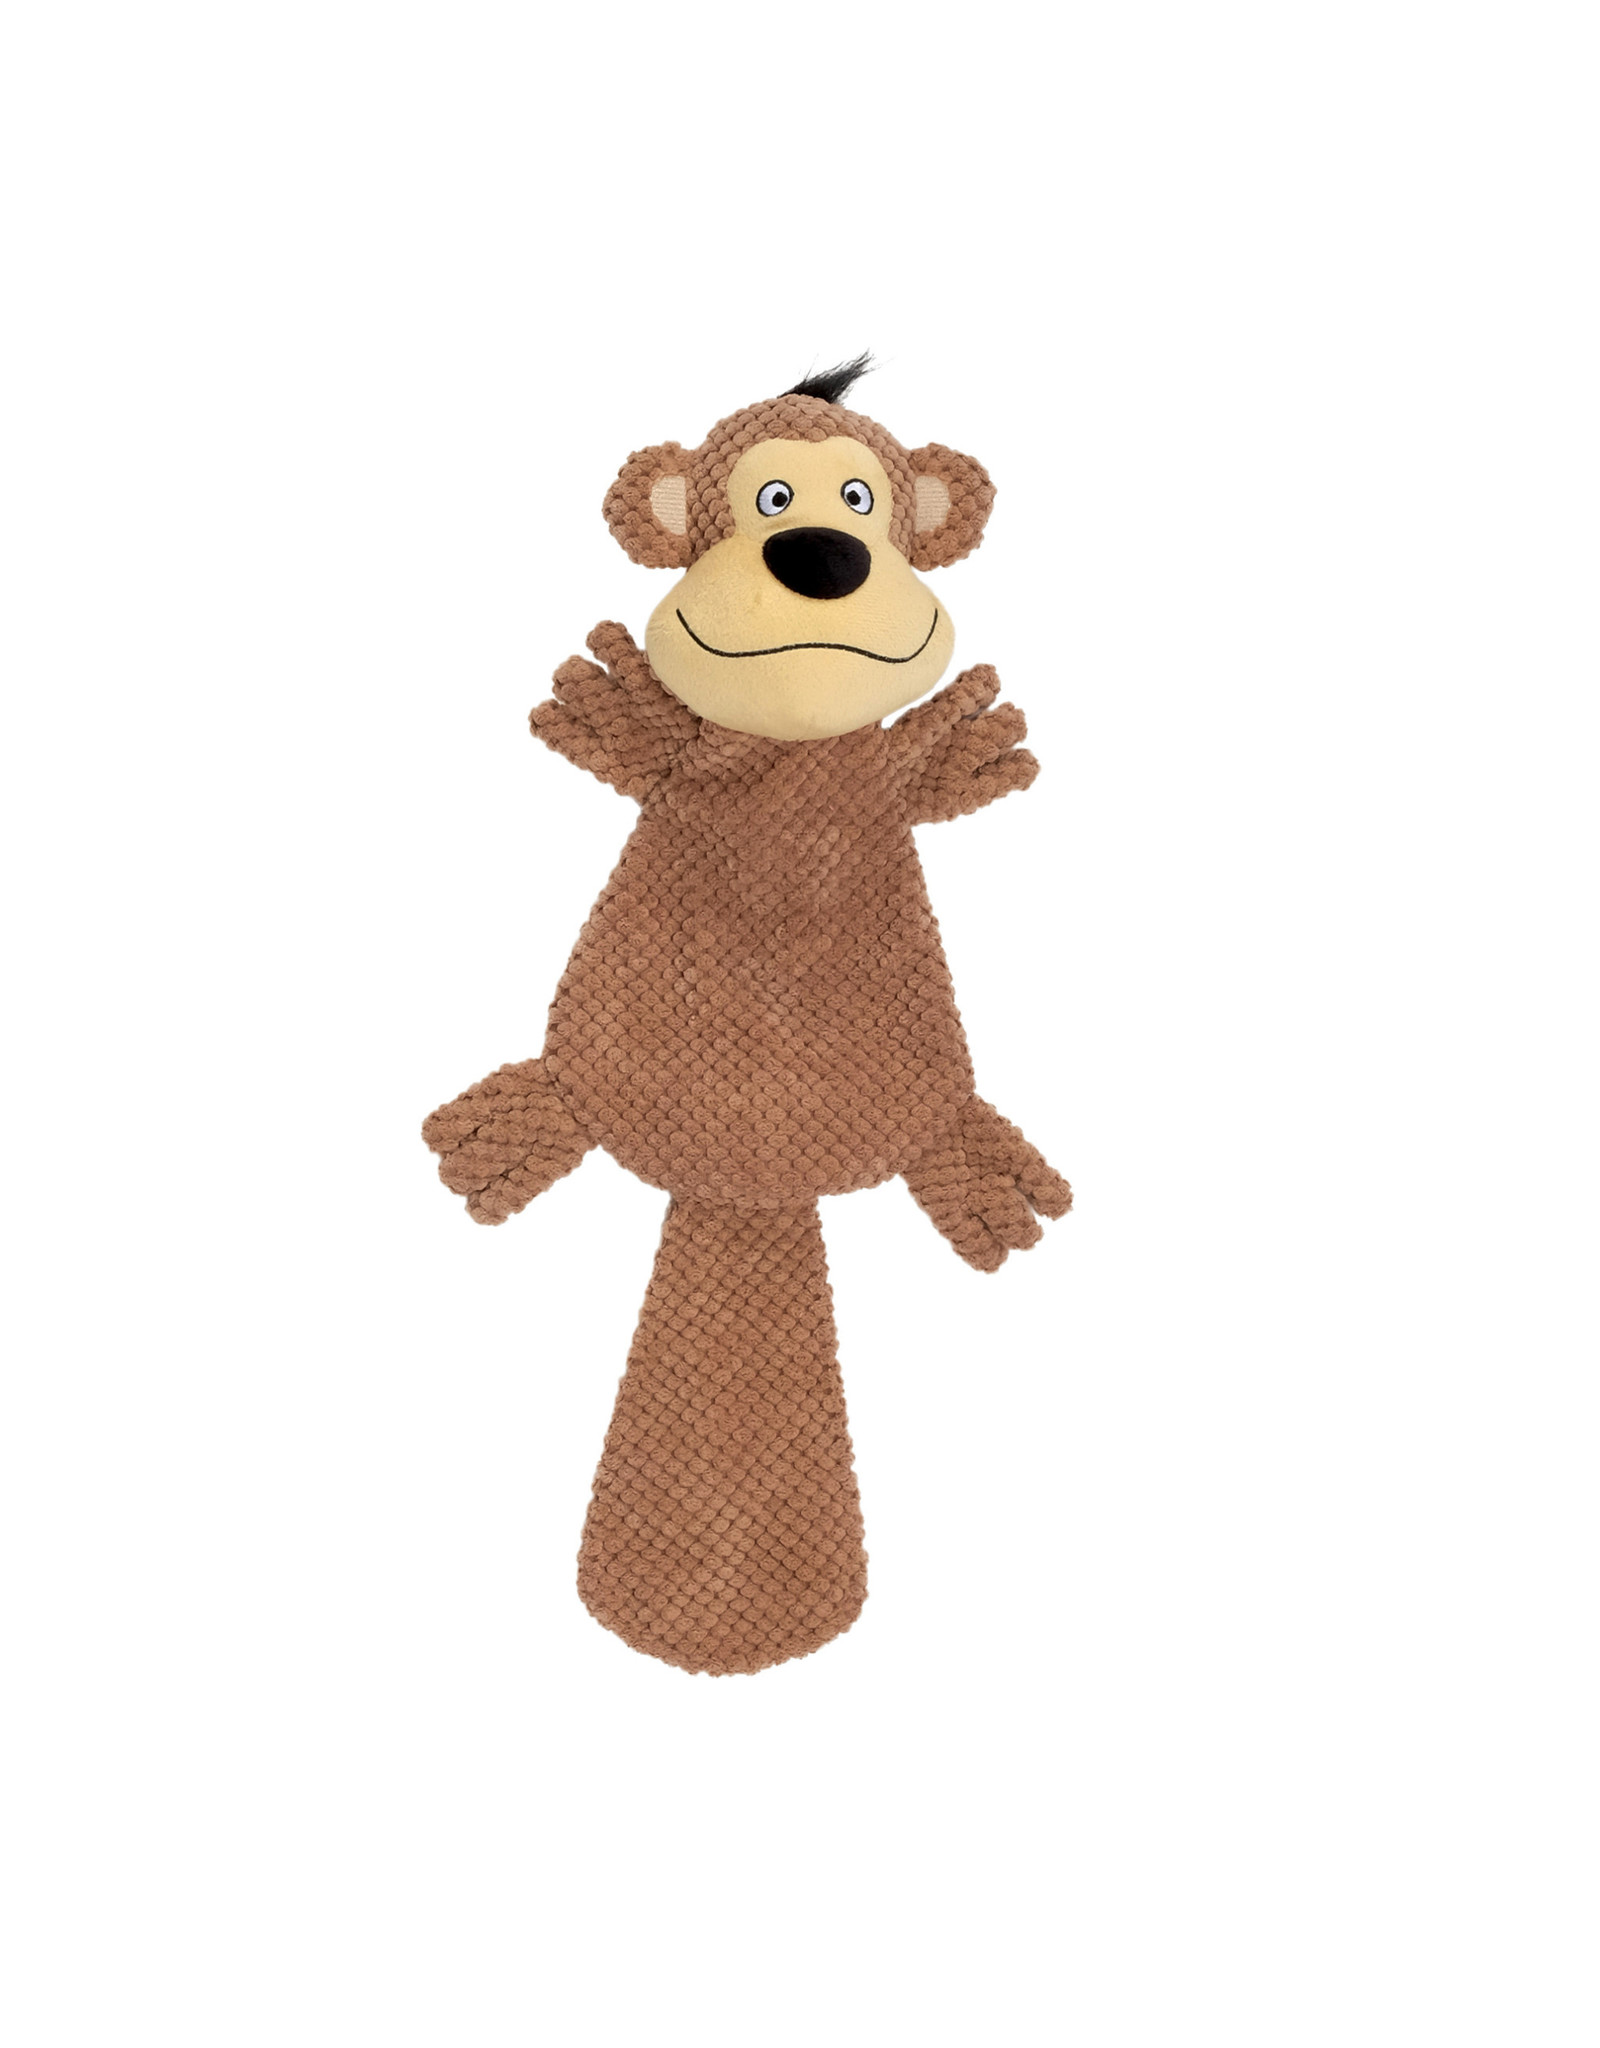 DogIt Dogit Stuffies – XL Flat Friend - Monkey - 49 cm (19.5 in)